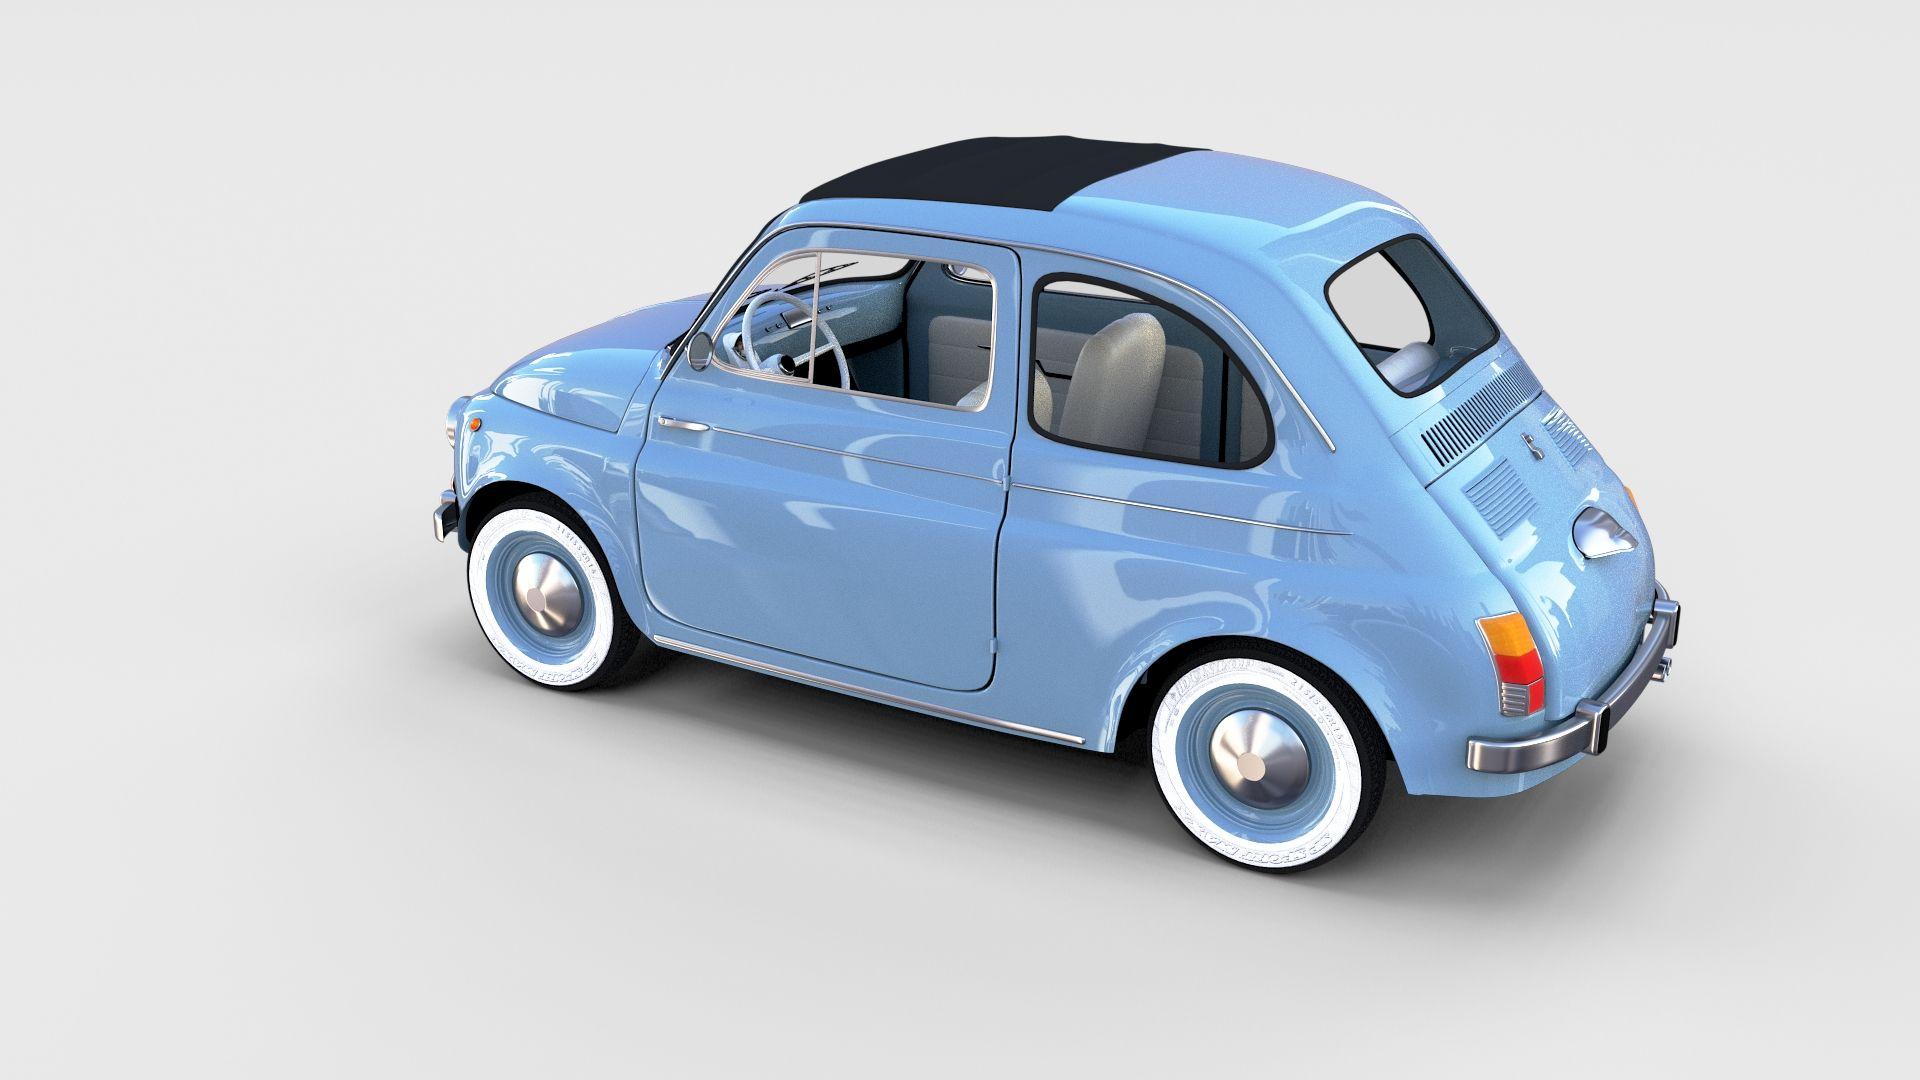 Fiat Nuova 500 1957 Rev With Images Fiat Logo Design Fiat 500